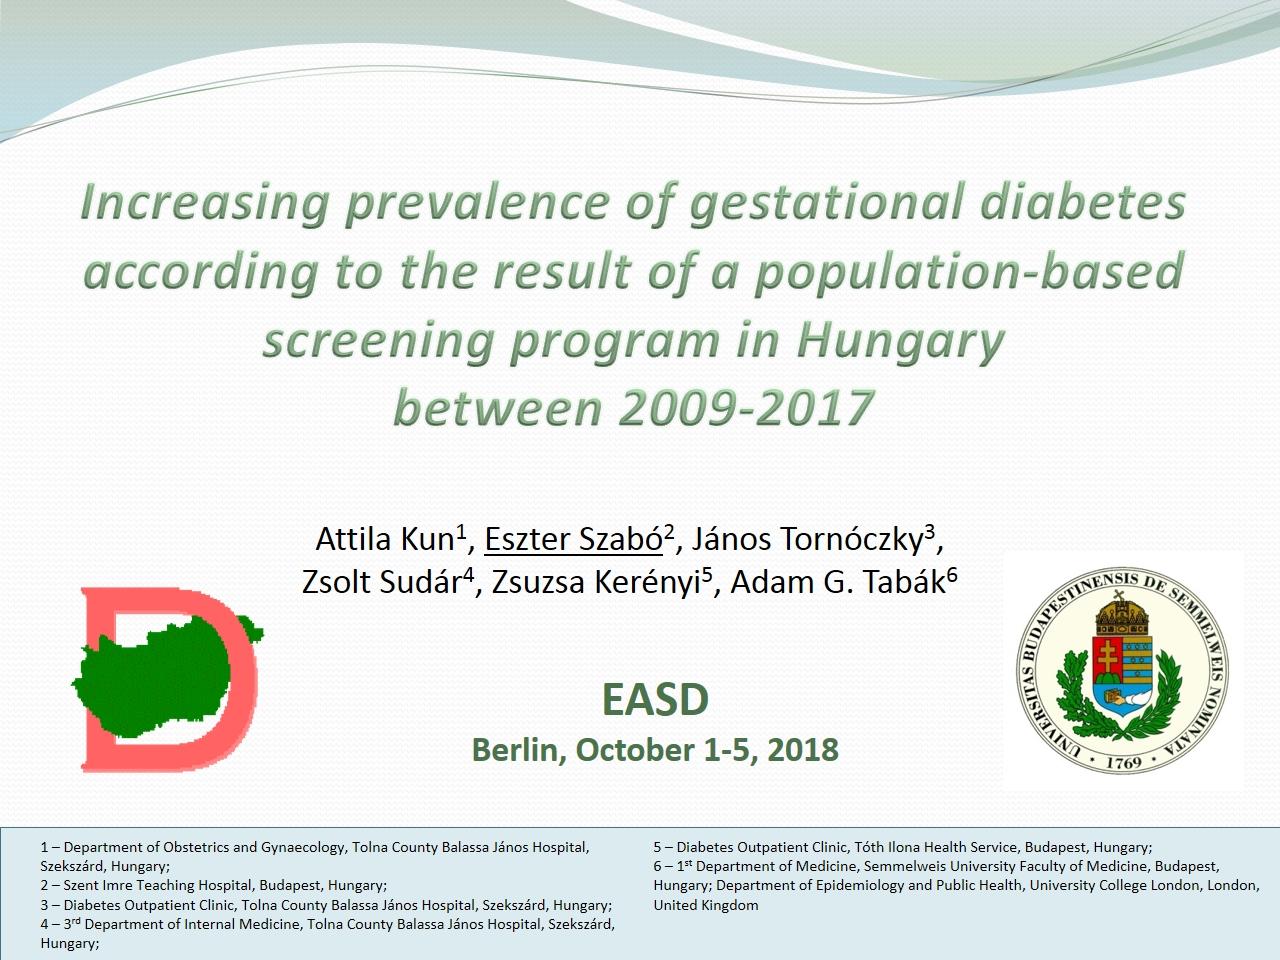 Increasing prevalence of gestational diabetes according to